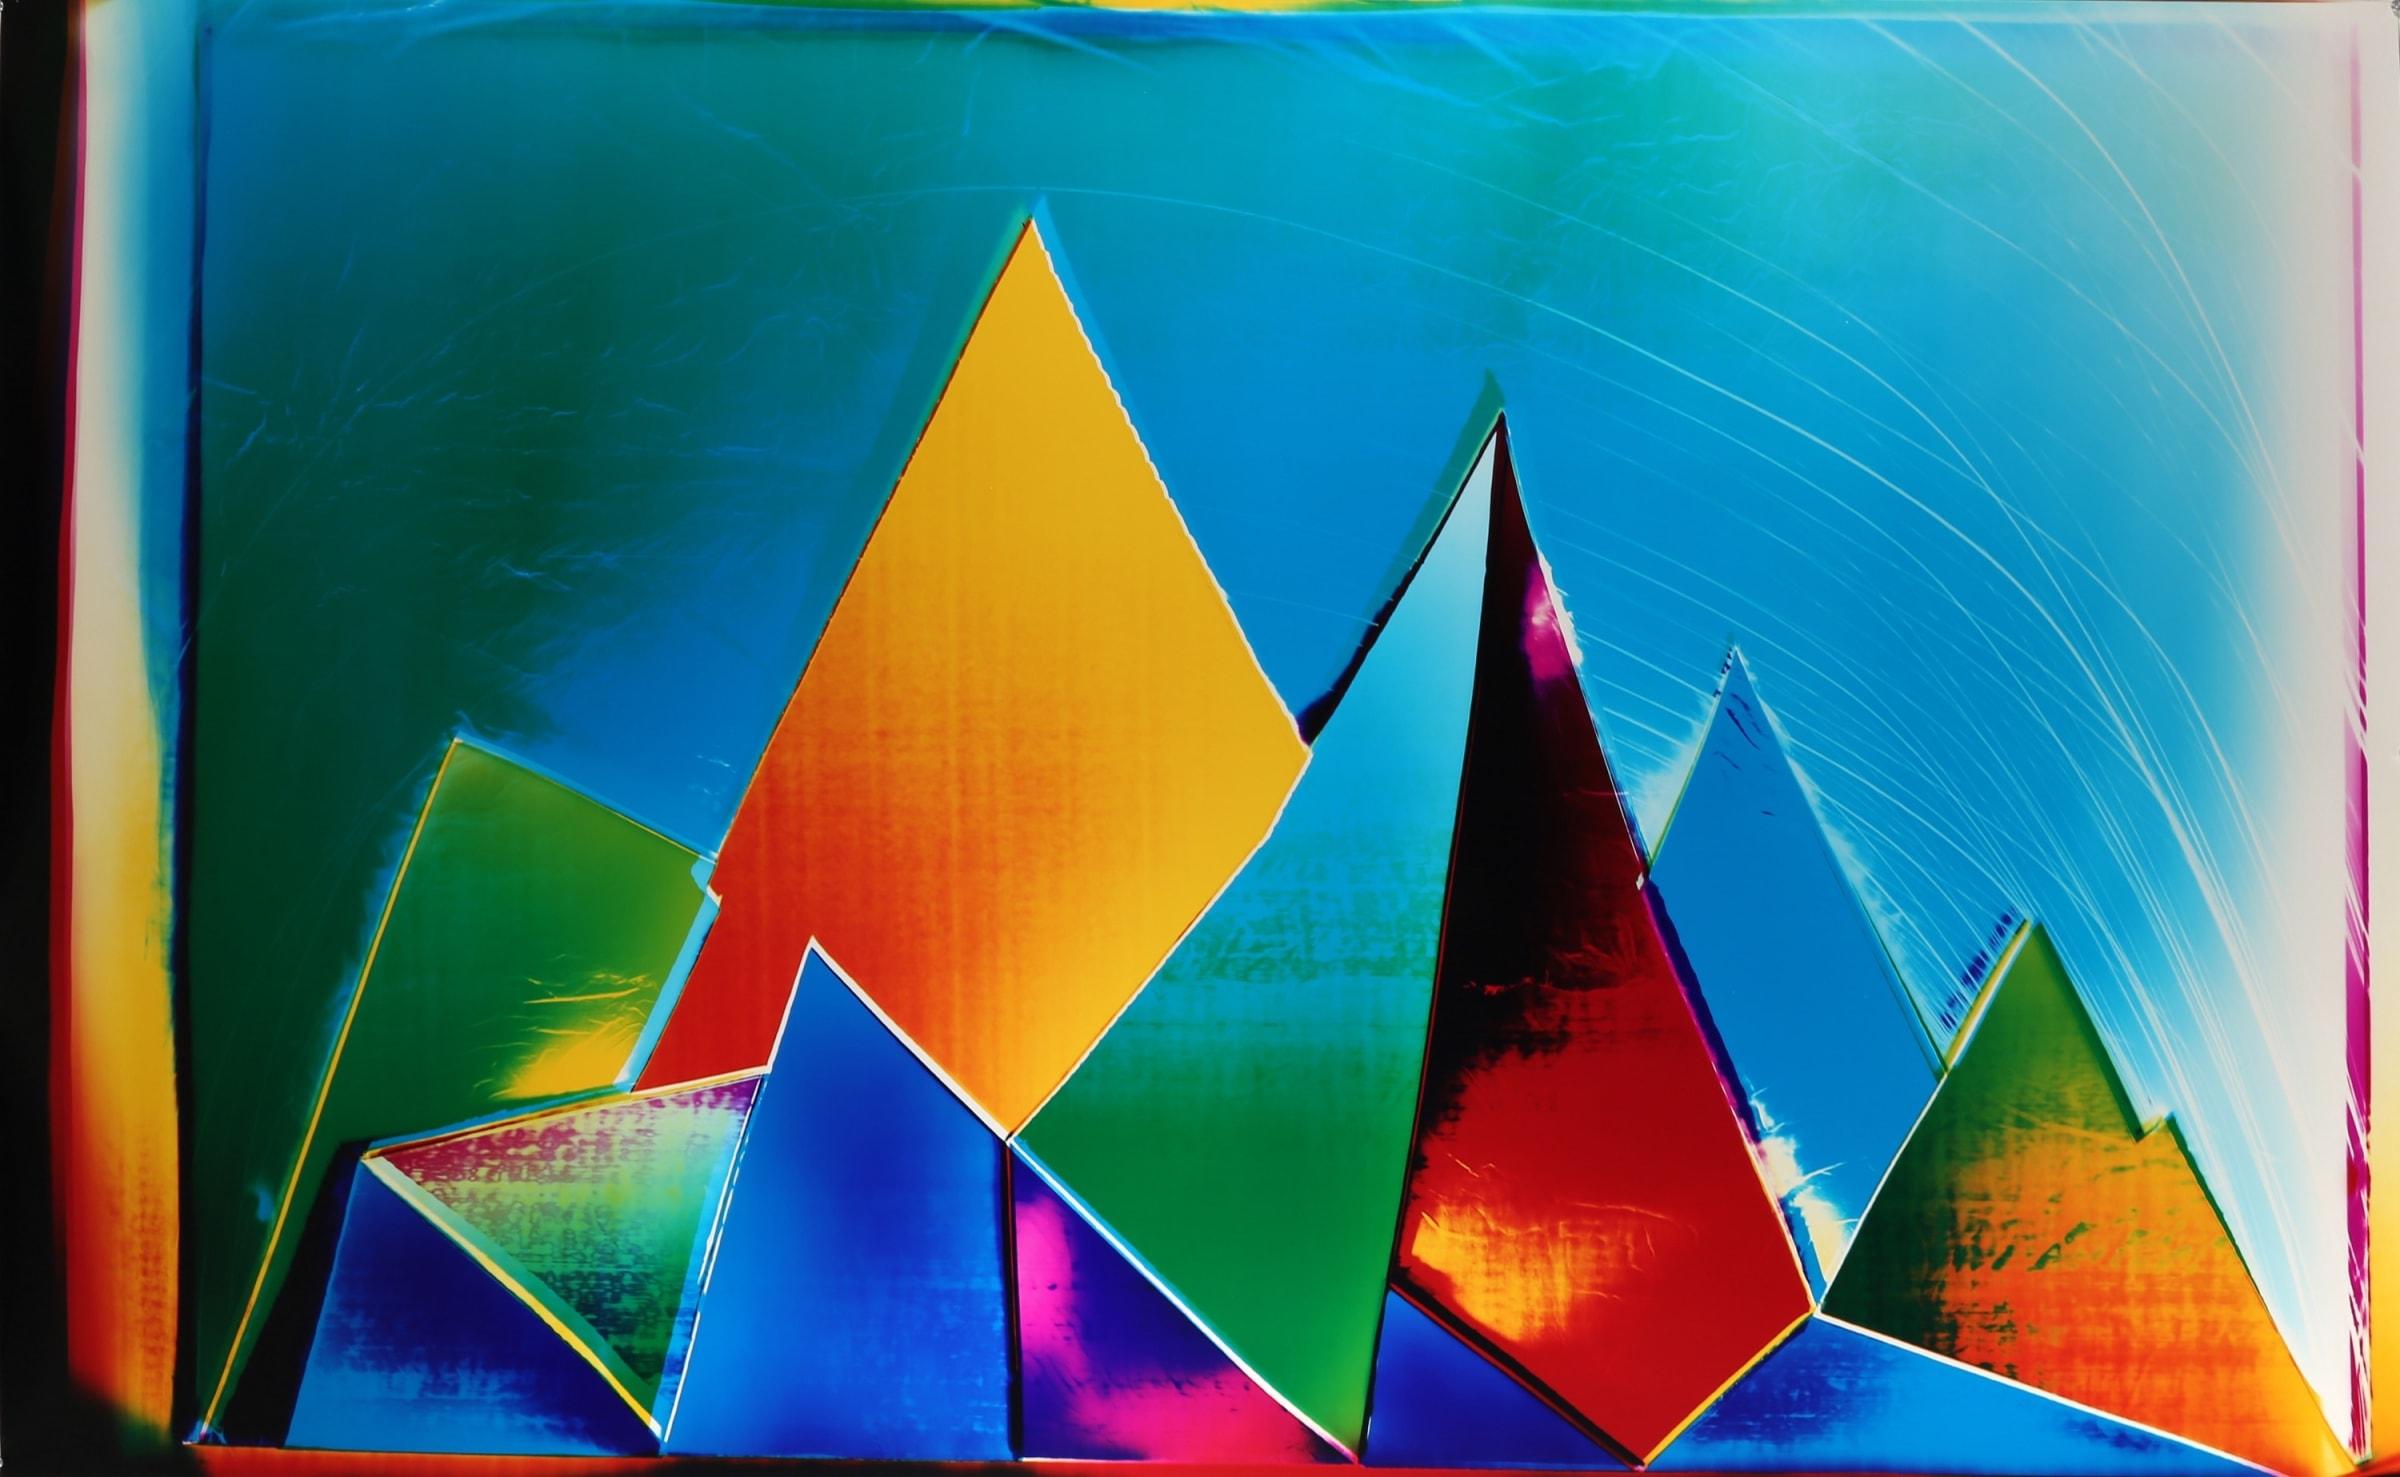 "<span class=""link fancybox-details-link""><a href=""/exhibitions/8/works/image103/"">View Detail Page</a></span><div class=""artist""><strong>Liz Nielsen</strong></div><div class=""title""><em>Underwater Mountains</em>, 2018</div><div class=""signed_and_dated"">Signed, titled and dated on artists label</div><div class=""medium"">Analogue Chromogenic Photogram on Fujiflex, Unique</div><div class=""dimensions"">127 x 203.2 cm</div>"